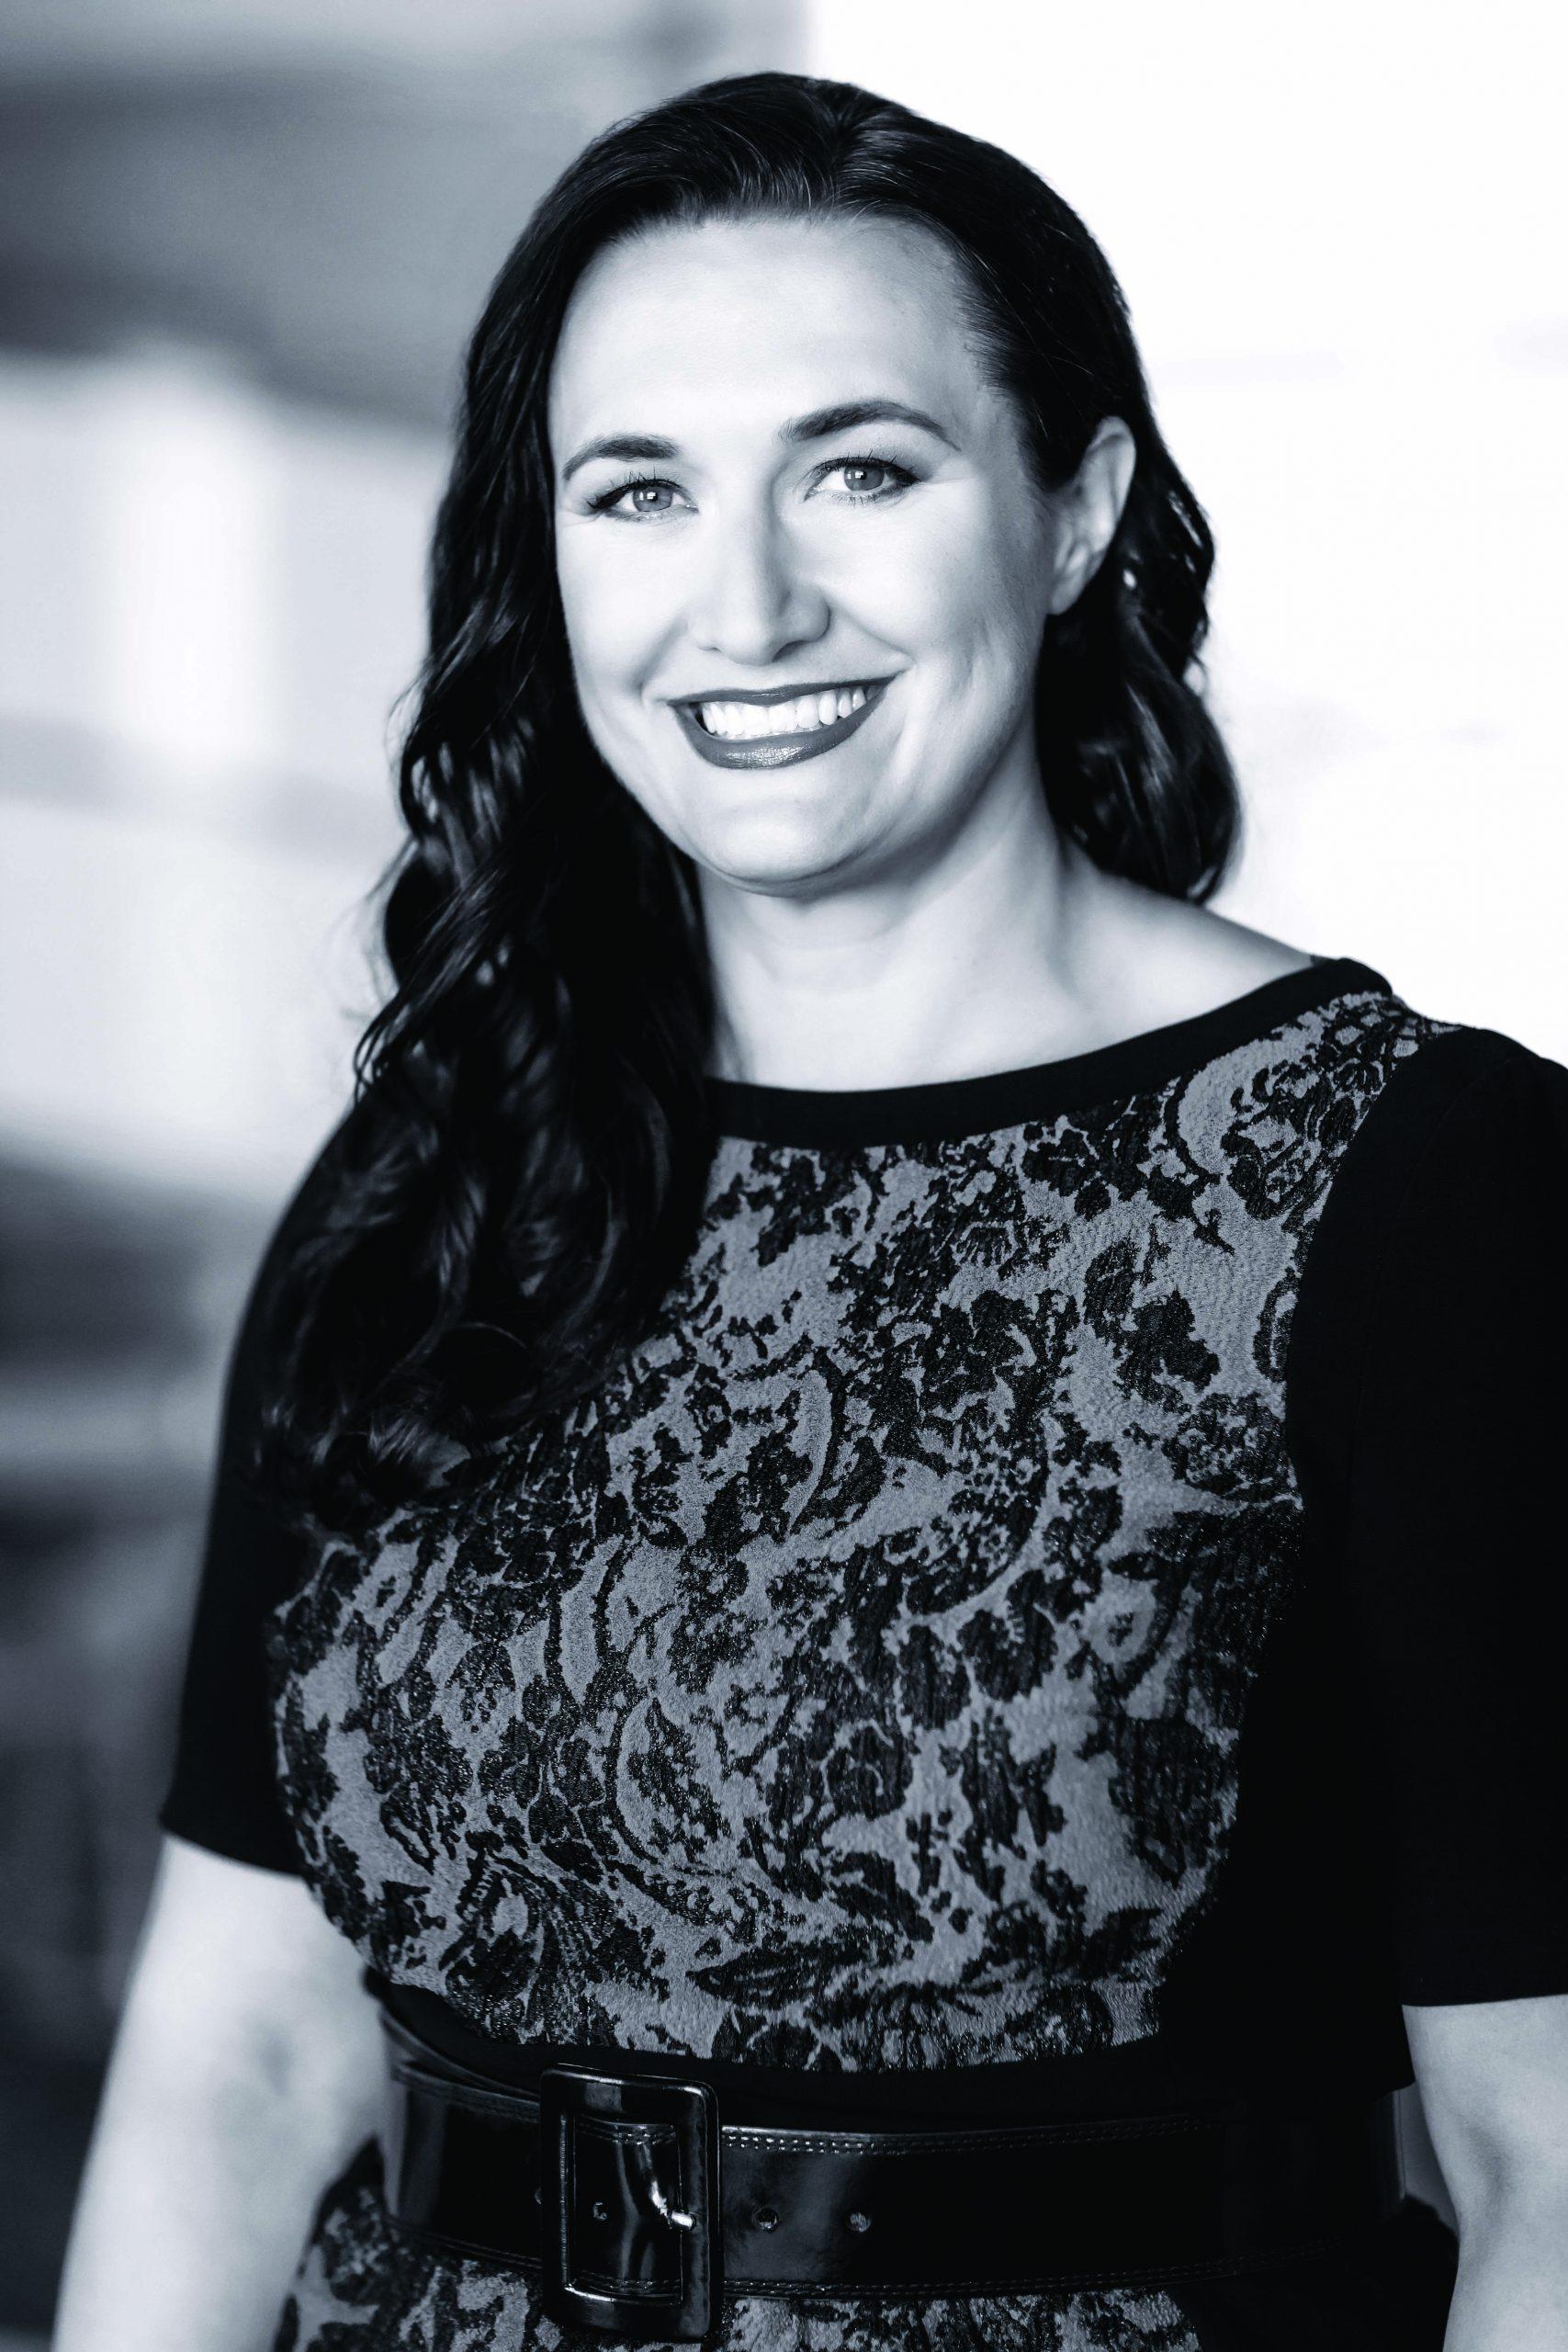 Cari Rincker is to be presented with Lake Land College 2018 Alumnus Achievement Award